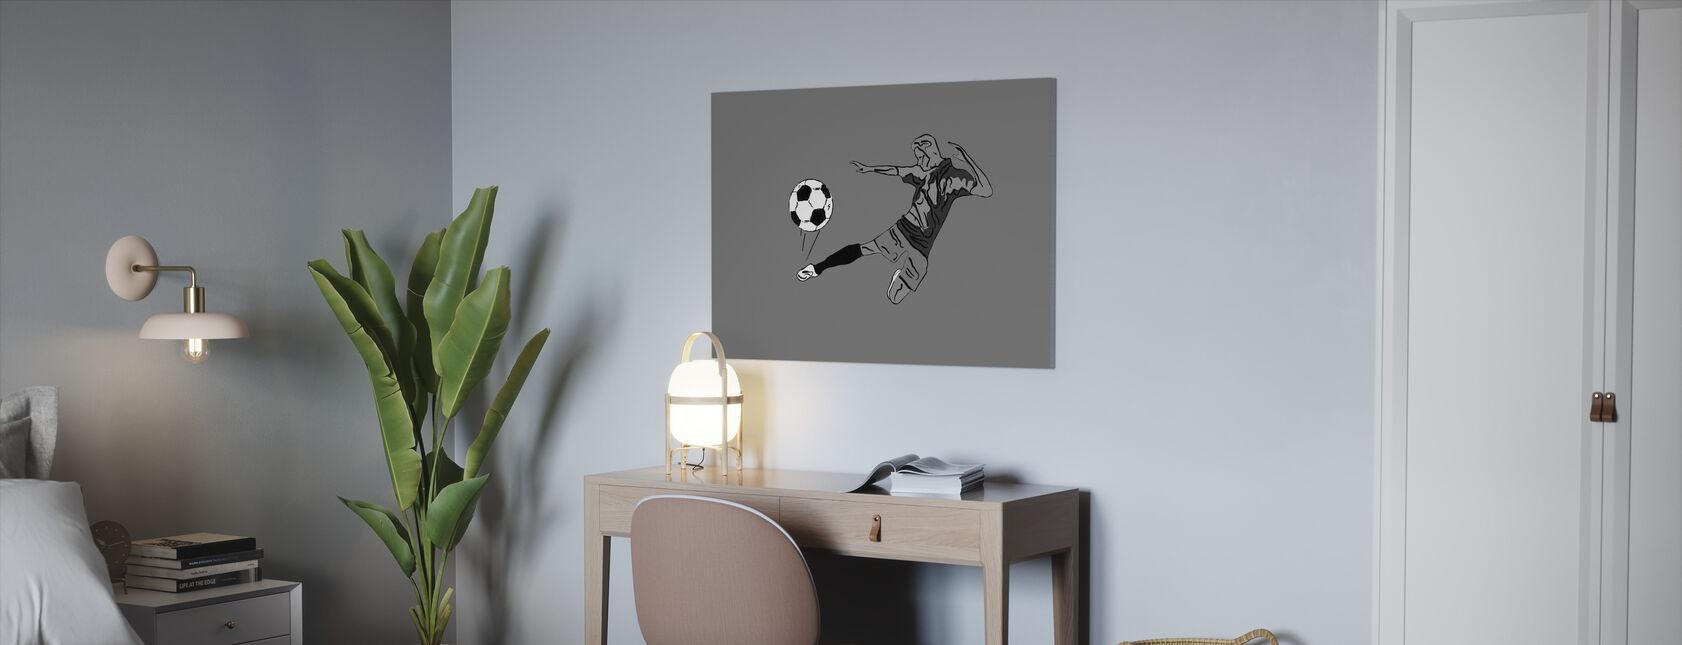 Kick It - Grijs - Canvas print - Kantoor